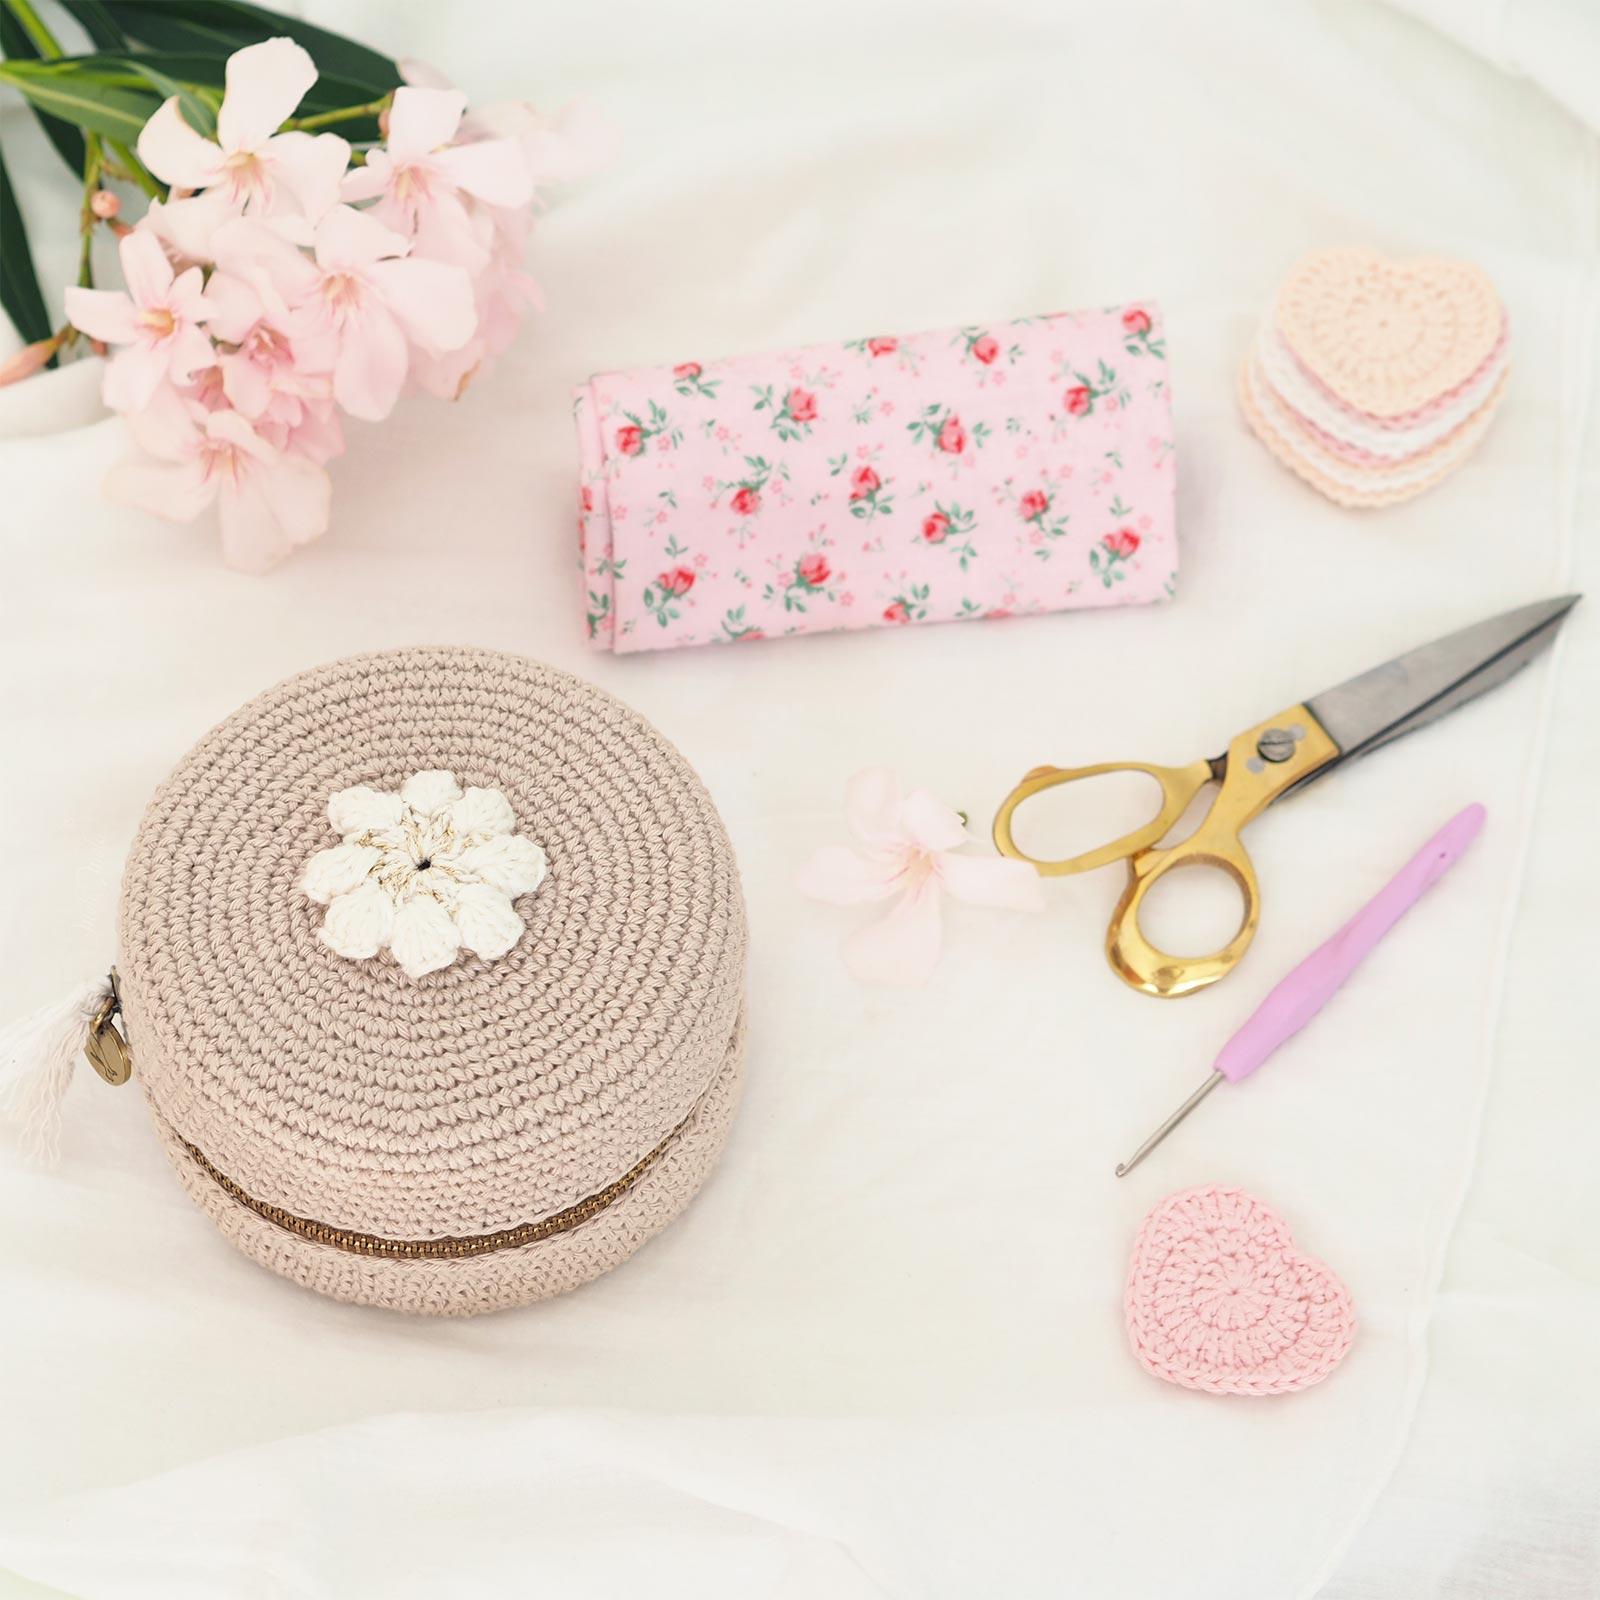 écrin macaron xl tuto crochet chouettekit coton Ricorumi laboutiquedemelimelo